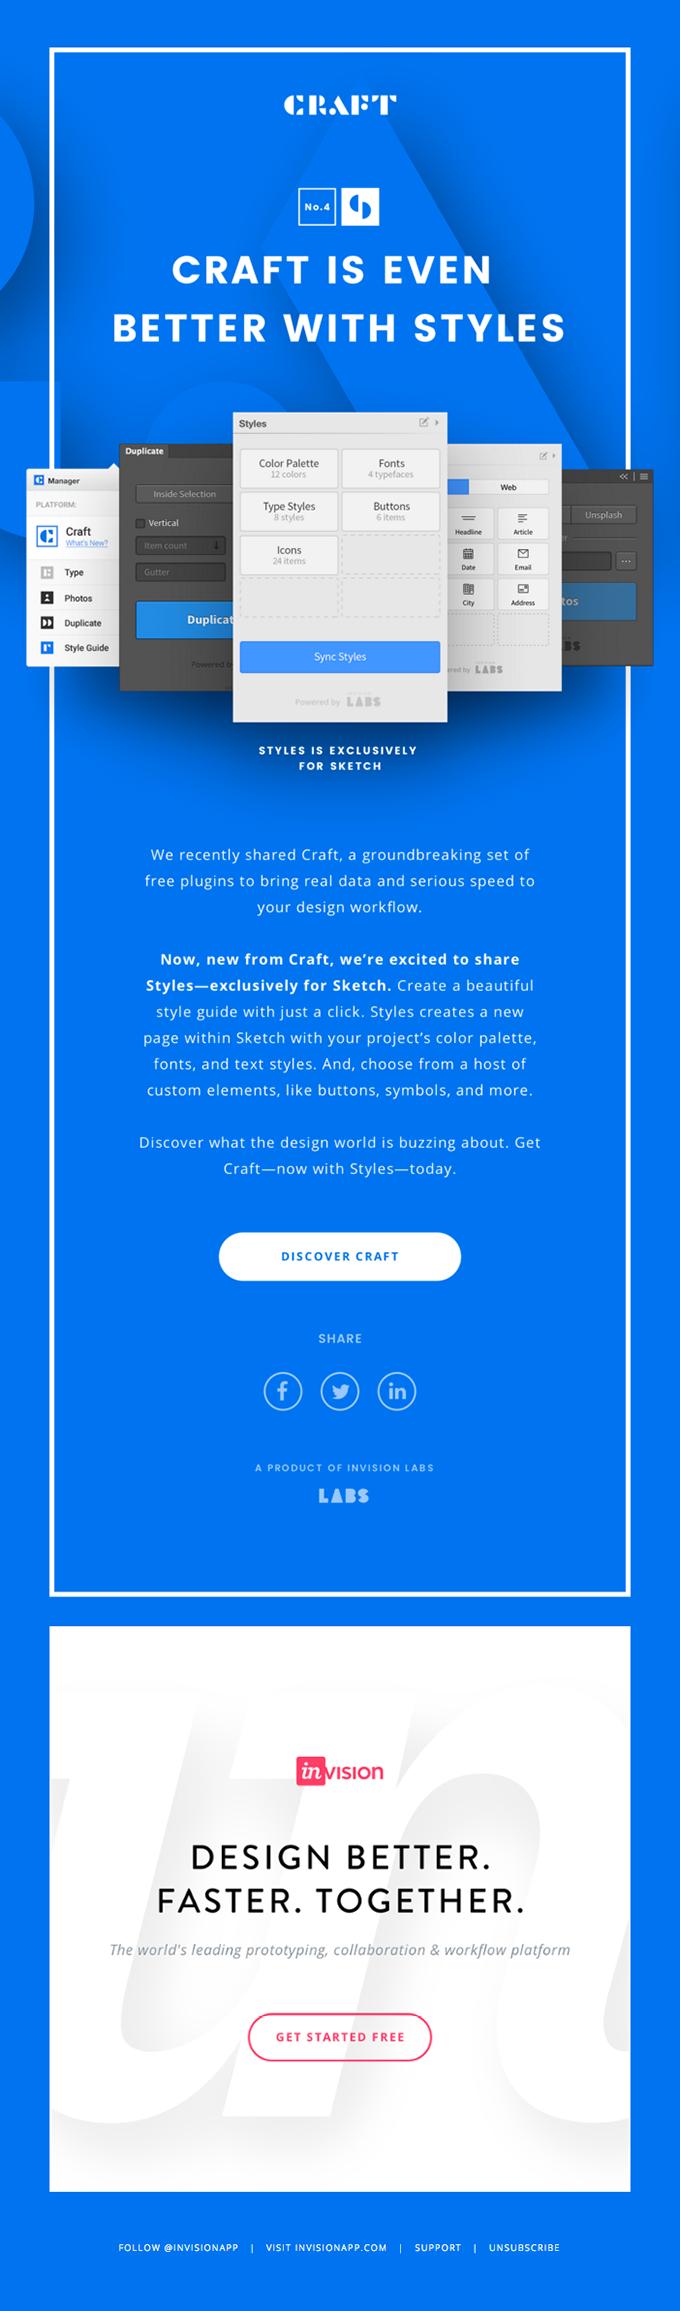 emejing email newsletter design ideas ideas trend ideas 2017 - Newsletter Design Ideas